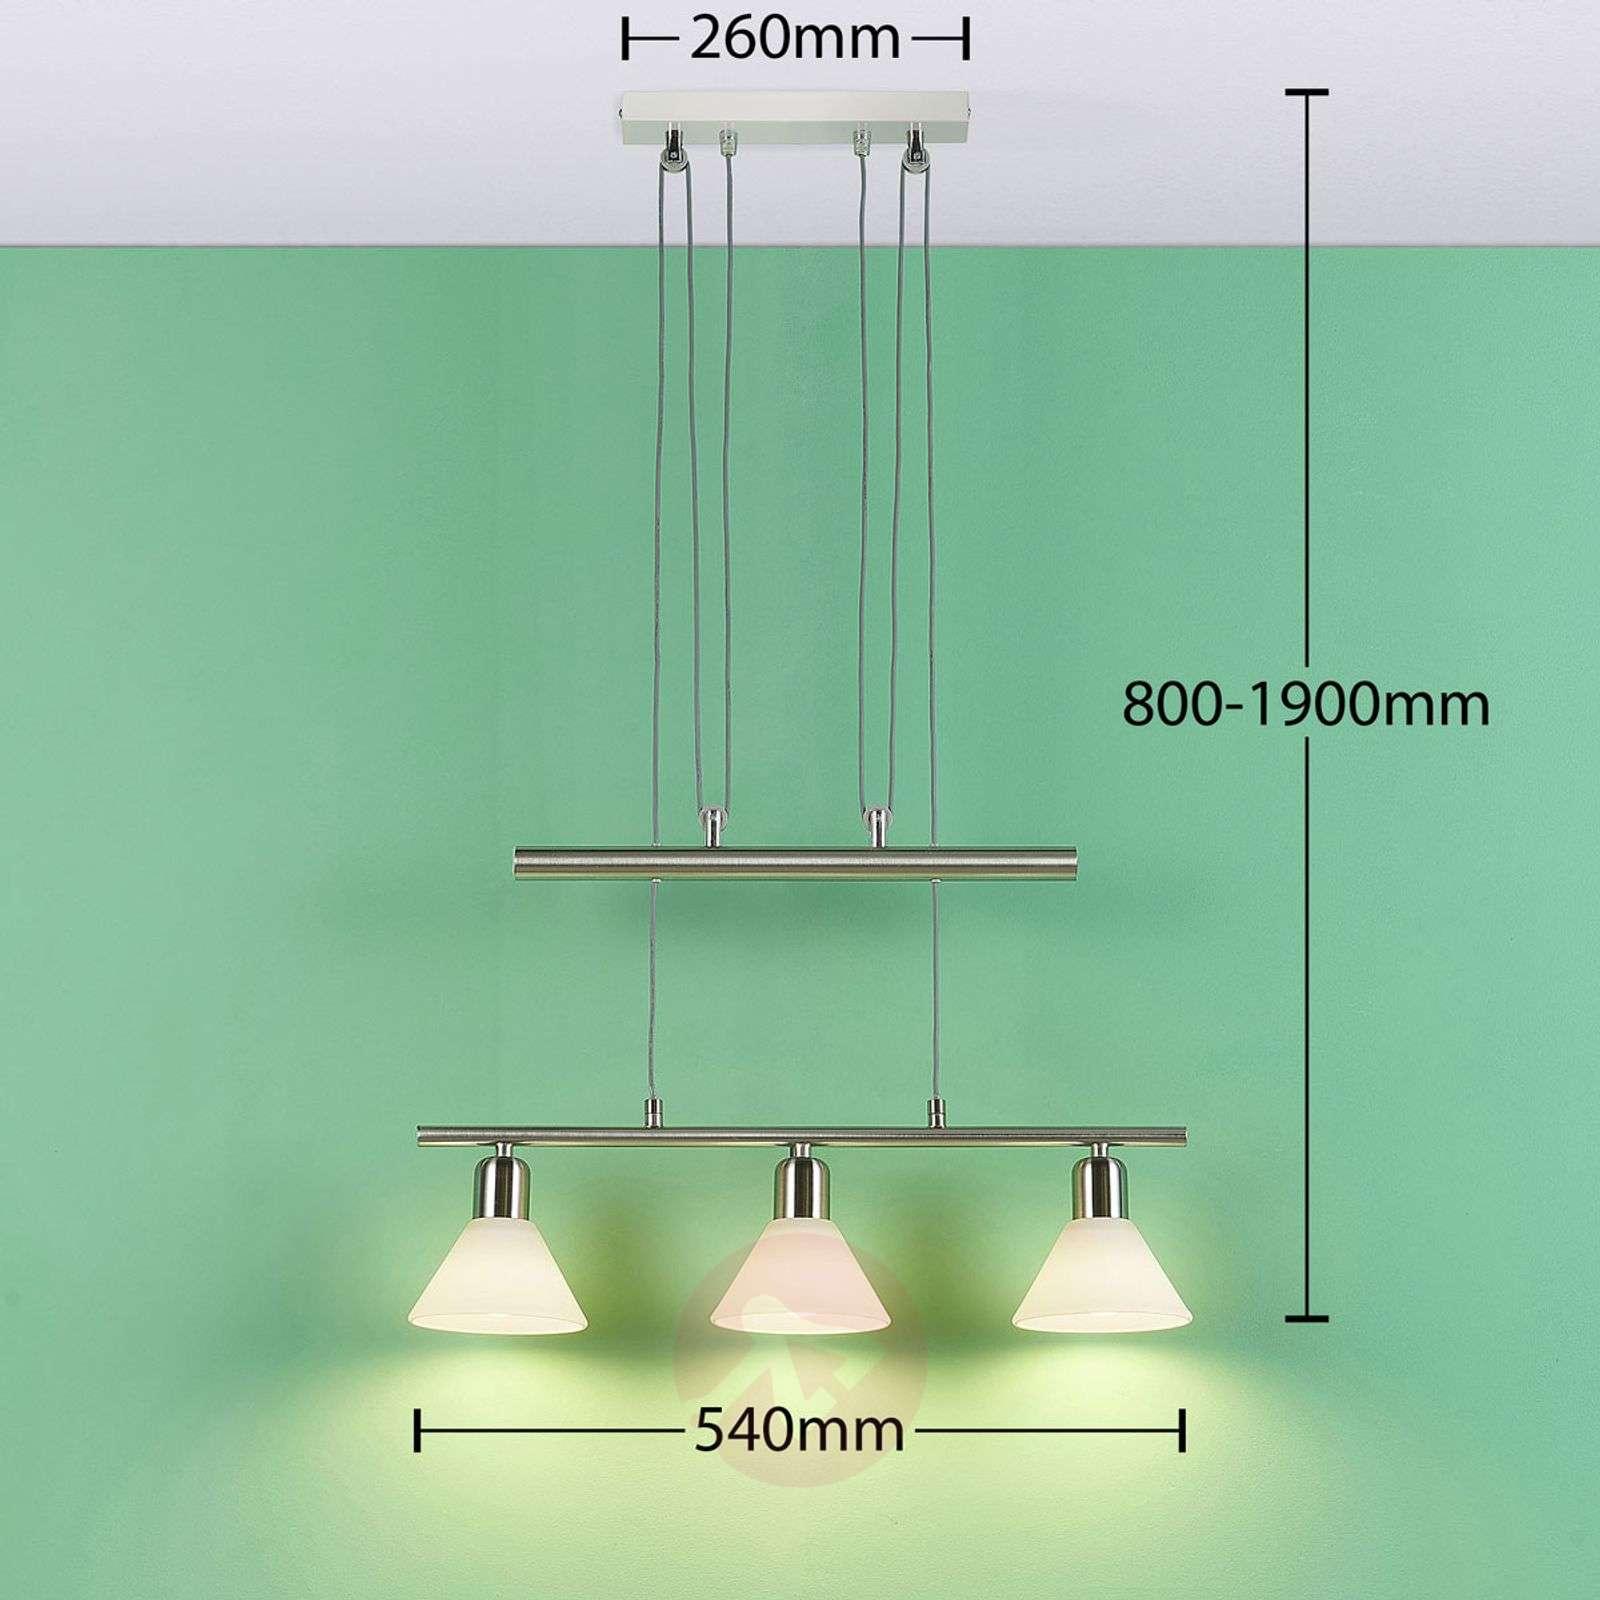 Easydim-ruokailutilan LED-riippuvalaisin Eleasa-9621384-02